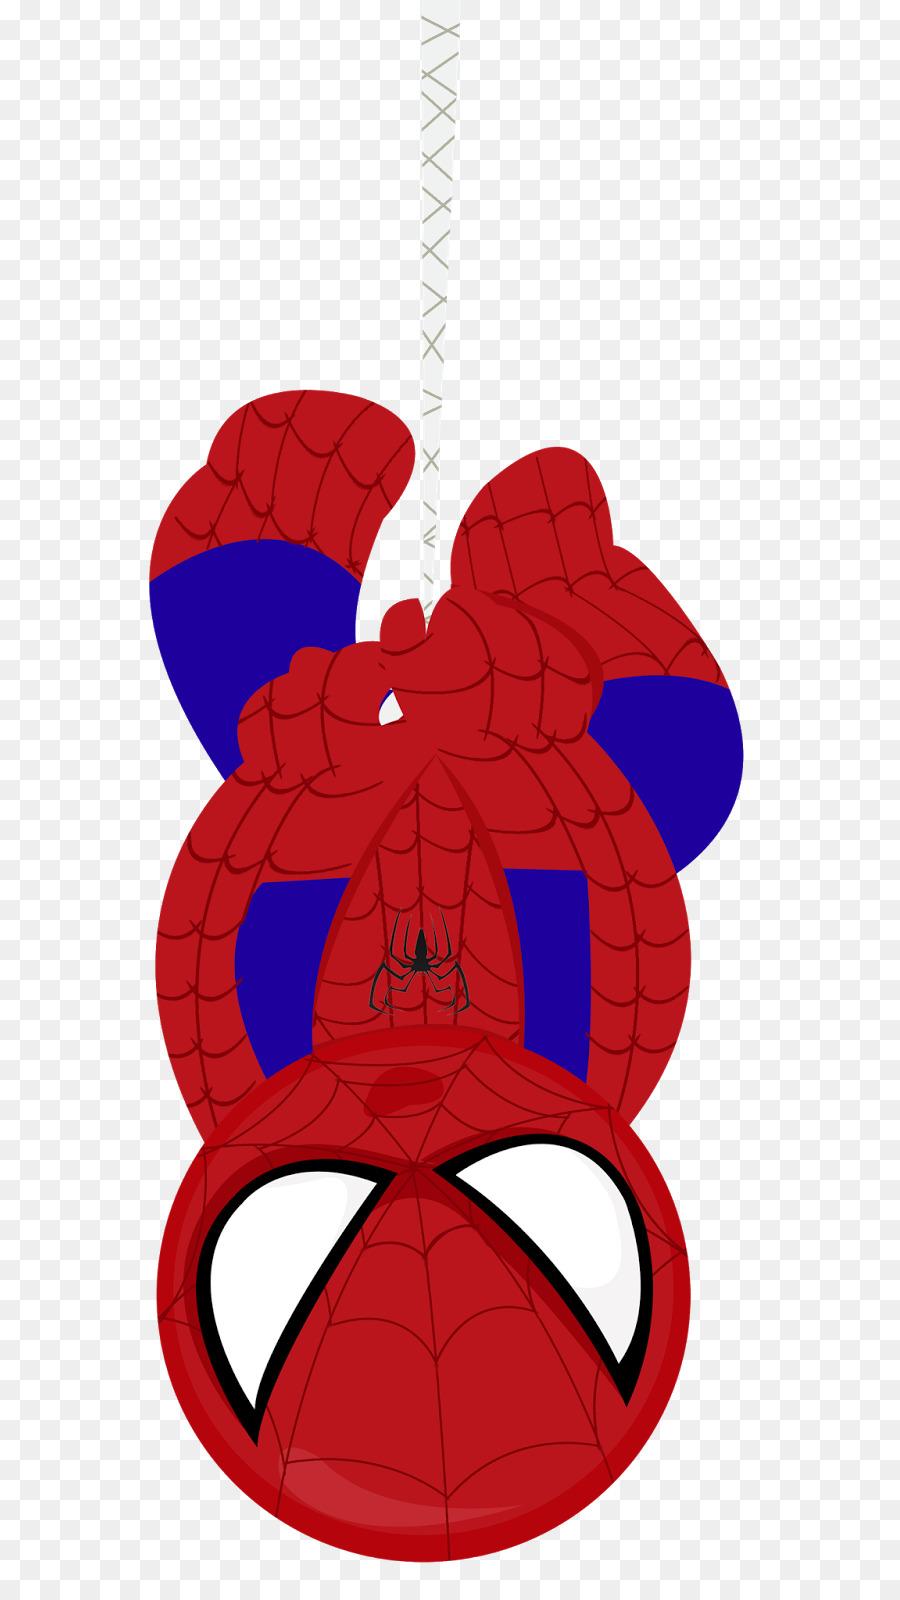 Spider-Man, Wolverine, Deadpool Superhéroe Clip art - iron spiderman ...